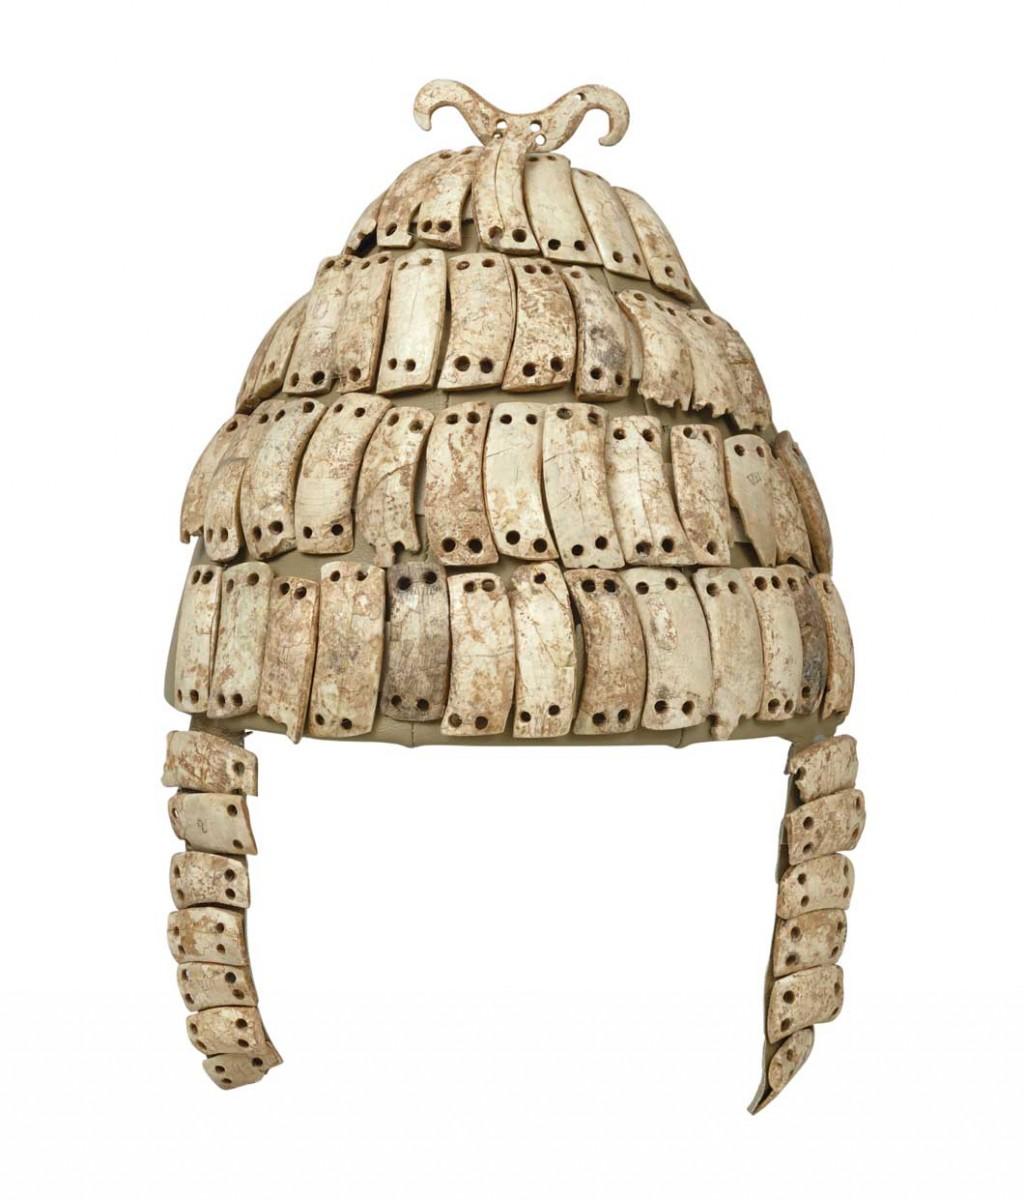 Oδοντόφρακτο κράνος με παραγναθίδες και οστέινο διπλό άγκιστρο στην κορυφή. Βρέθηκε στον θαλαμωτό τάφο 515 στις Μυκήνες. Έκθεση Μυκηναϊκών Αρχαιοτήτων, αίθουσα 4, προθήκη Μ30 (Εθνικό Αρχαιολογικό Μουσείο, αρ. ευρ. 6568).